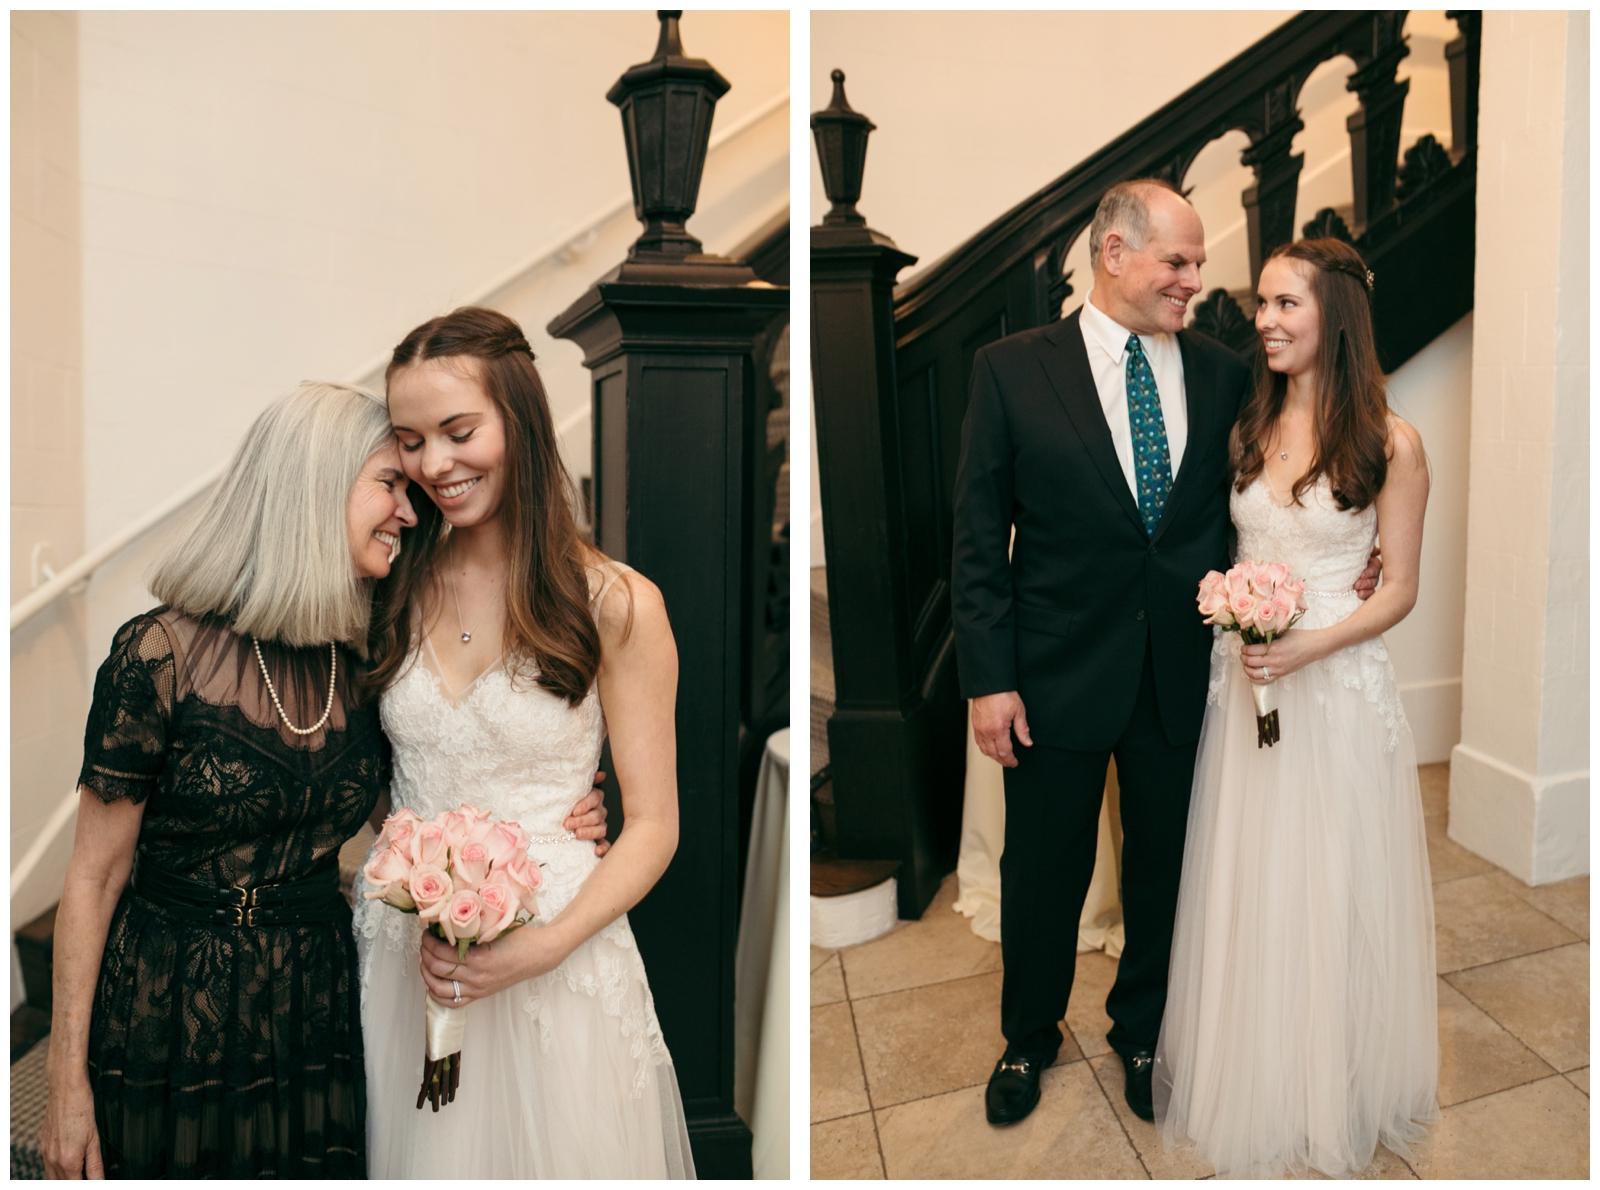 Alden-Castle-Wedding-Boston-Bailey-Q-Photo-036.jpg